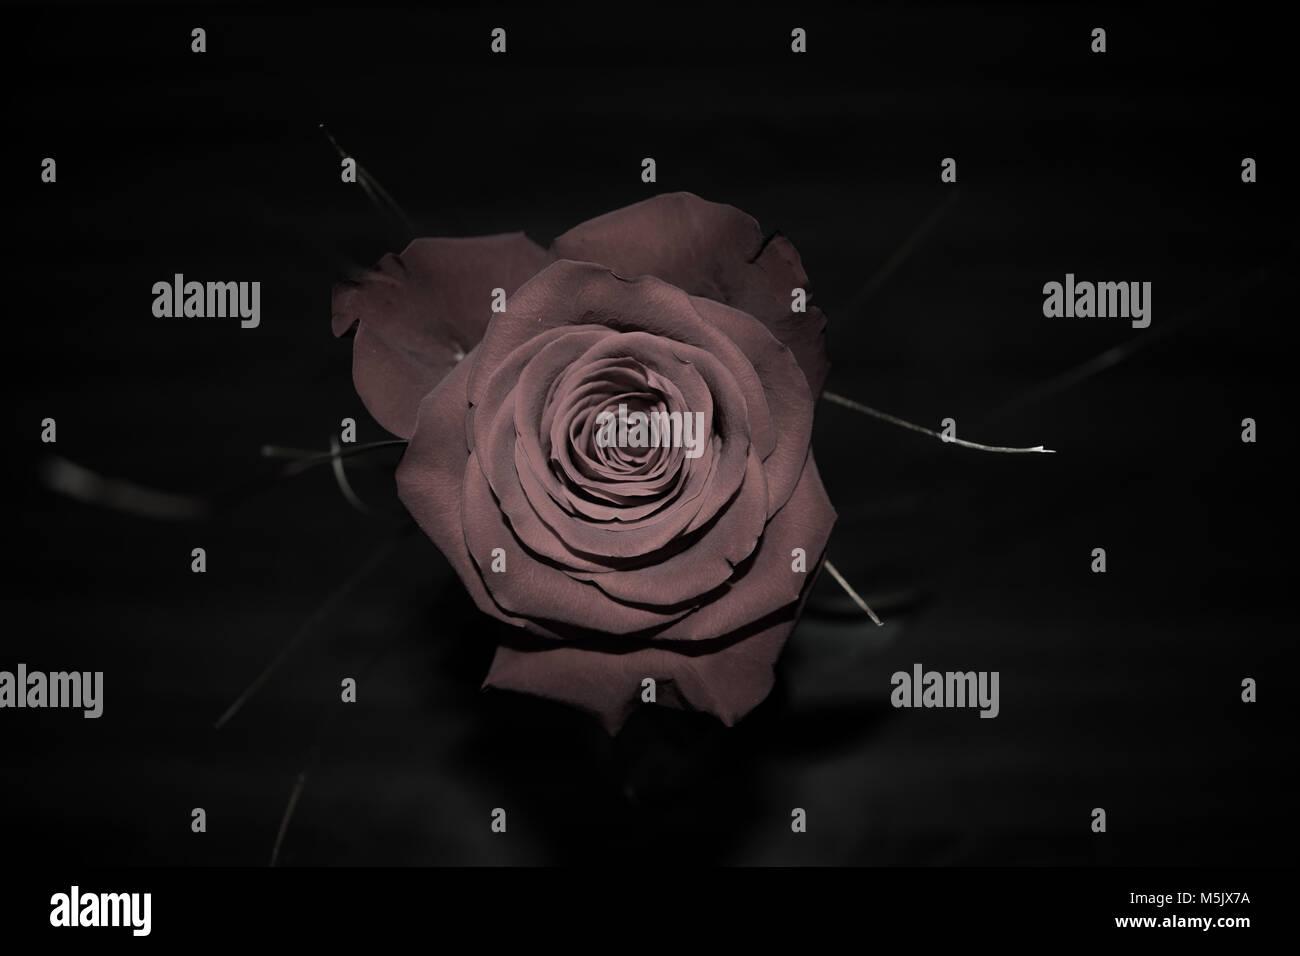 Dark Rose Dark Background Rose Is In Focus Some Light Stock Photo Alamy